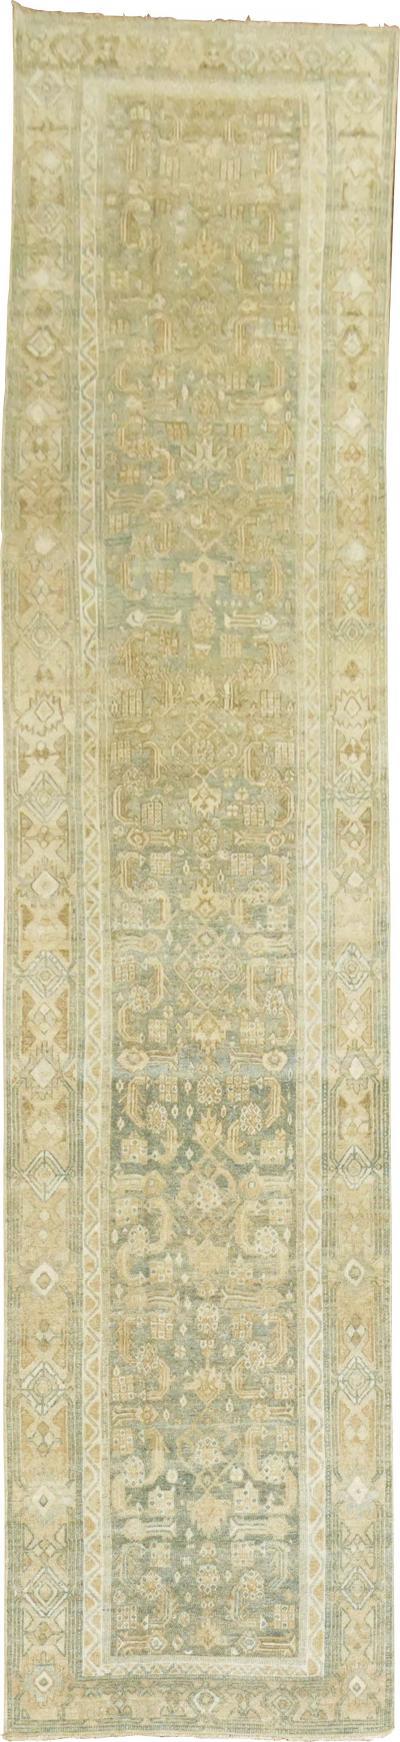 Sand Green Persian Runner rug no j1745